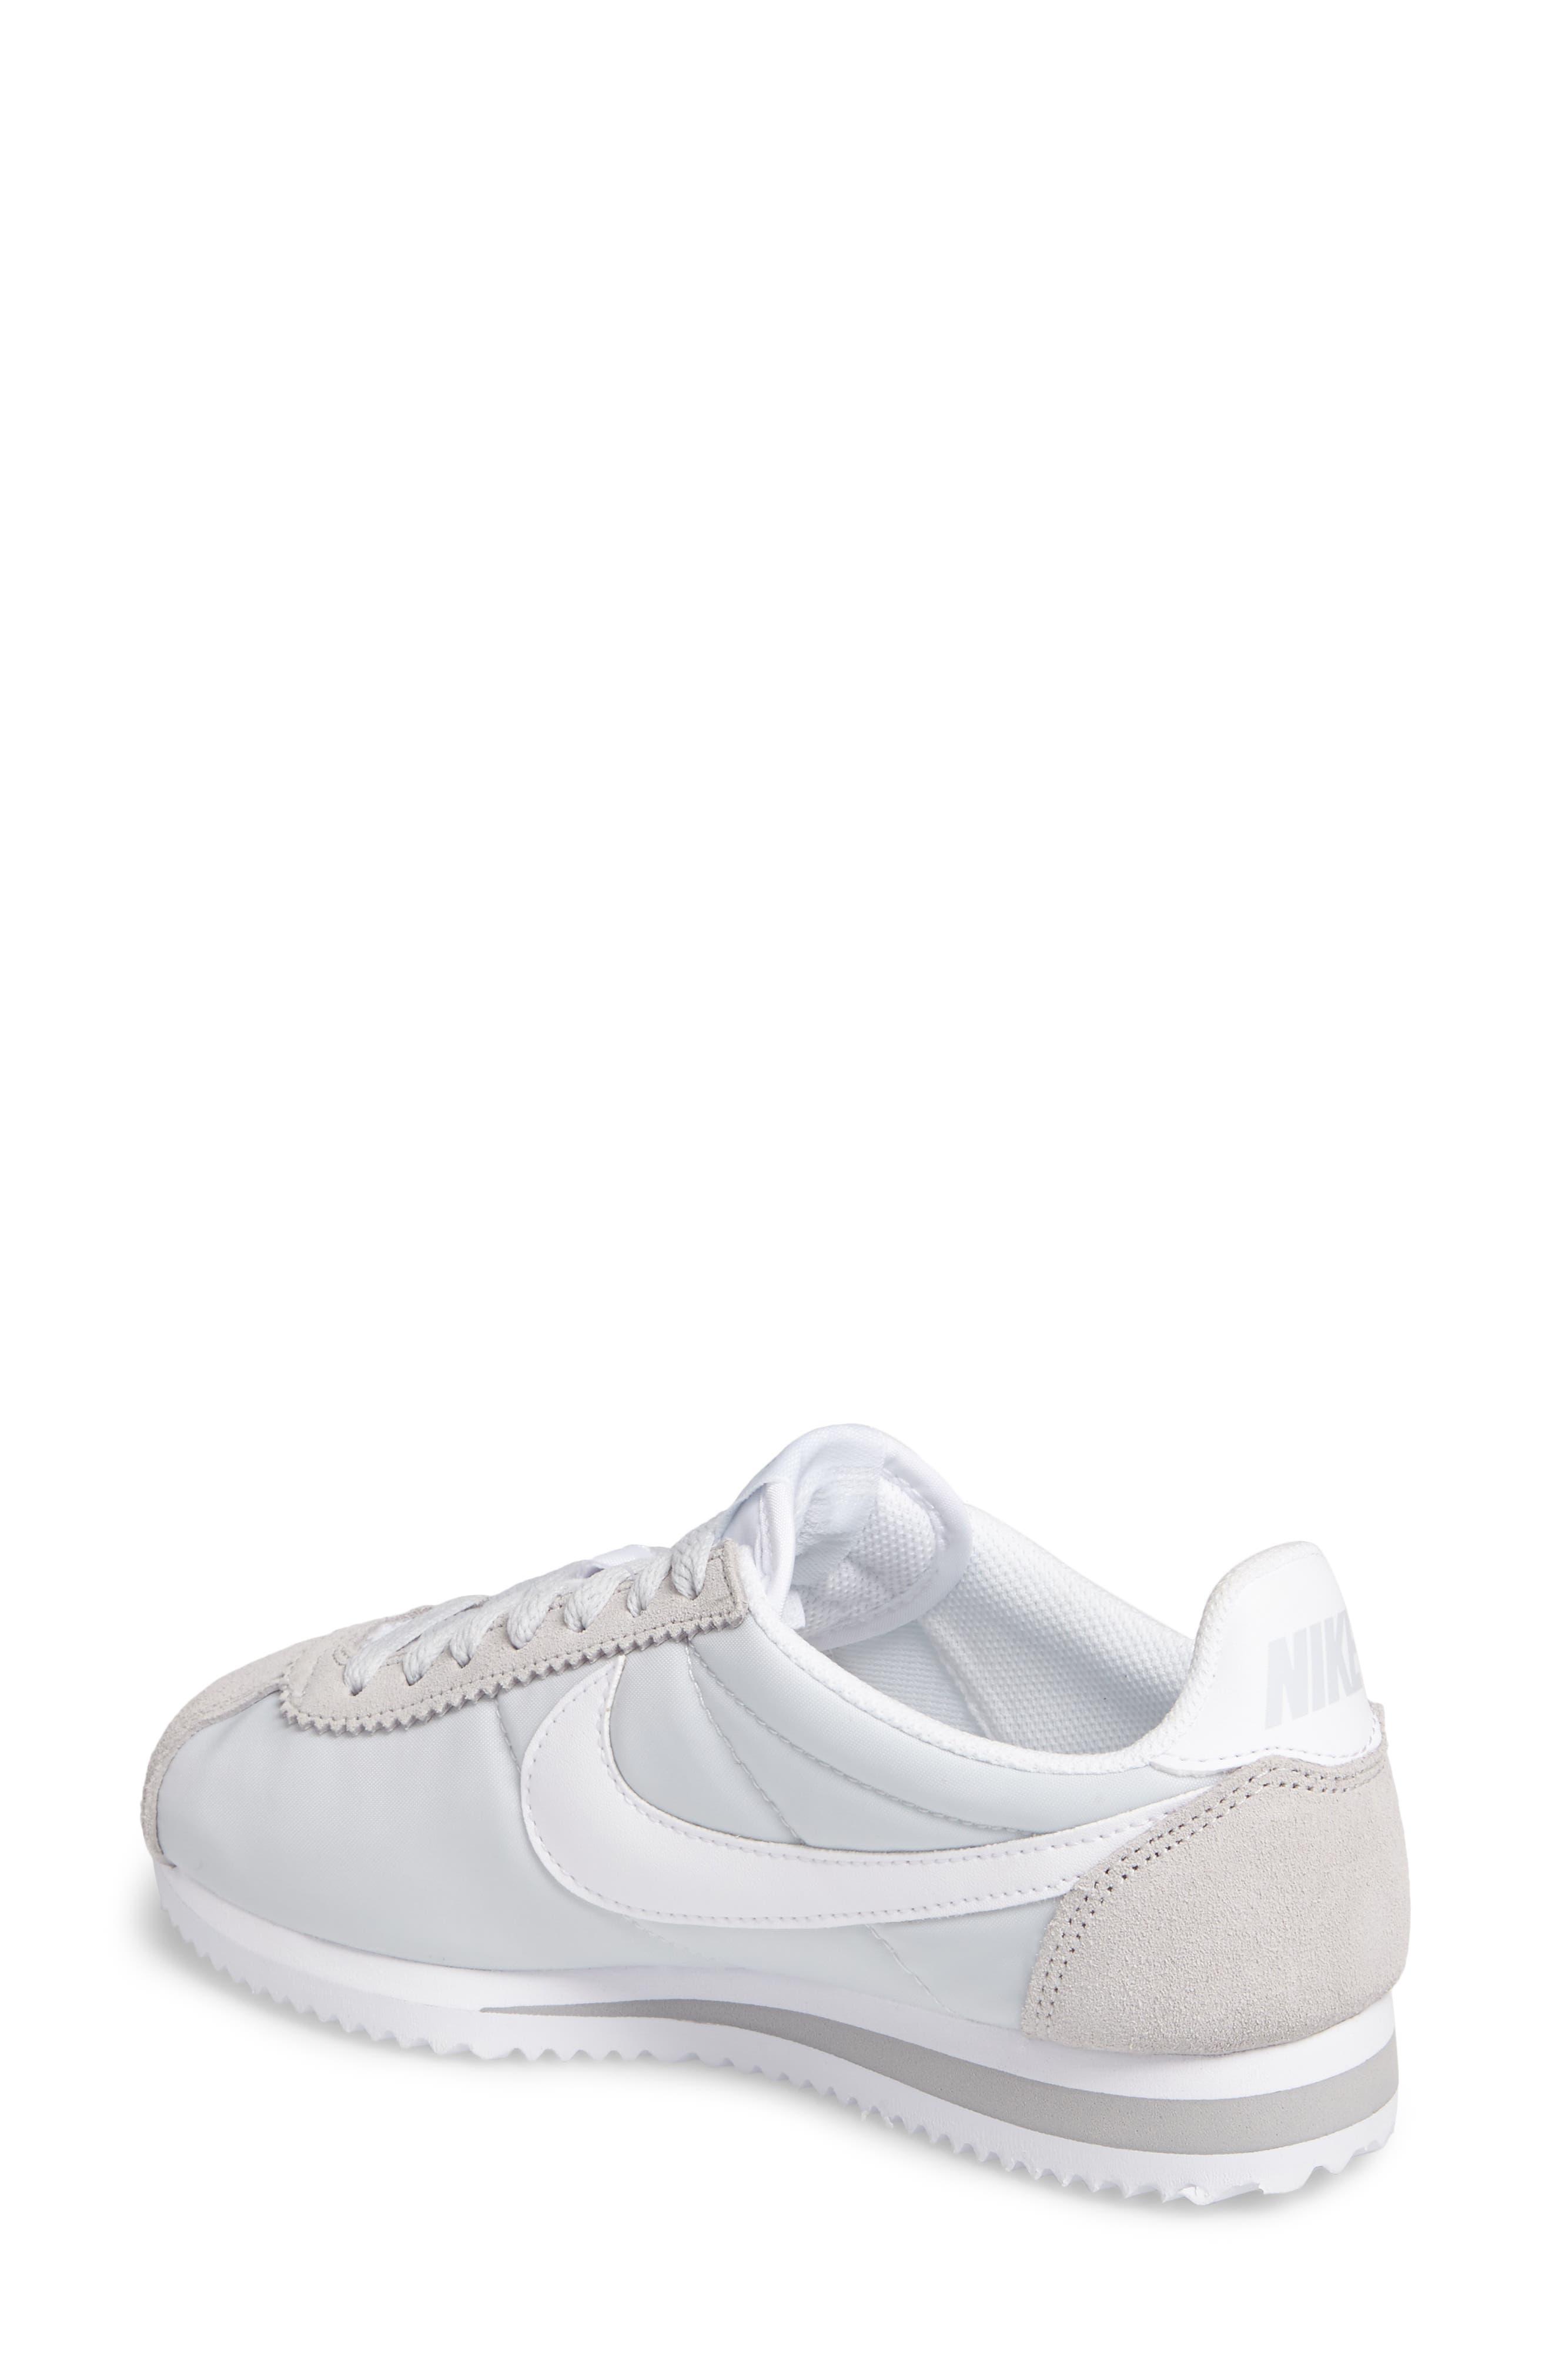 'Classic Cortez' Sneaker,                             Alternate thumbnail 2, color,                             Pure Platinum/ White